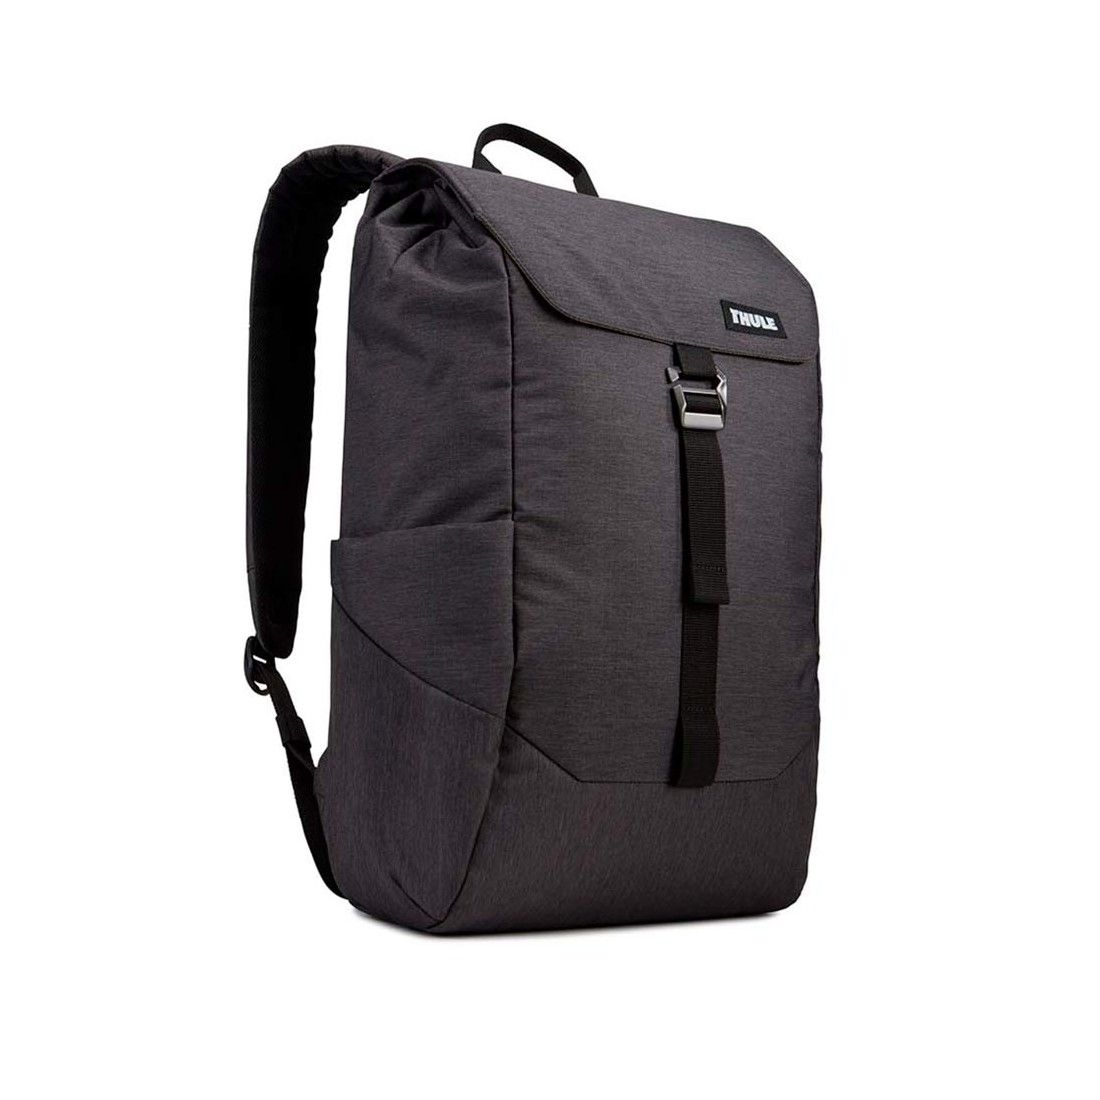 Mochila Lithos Backpack 16 L - Thule